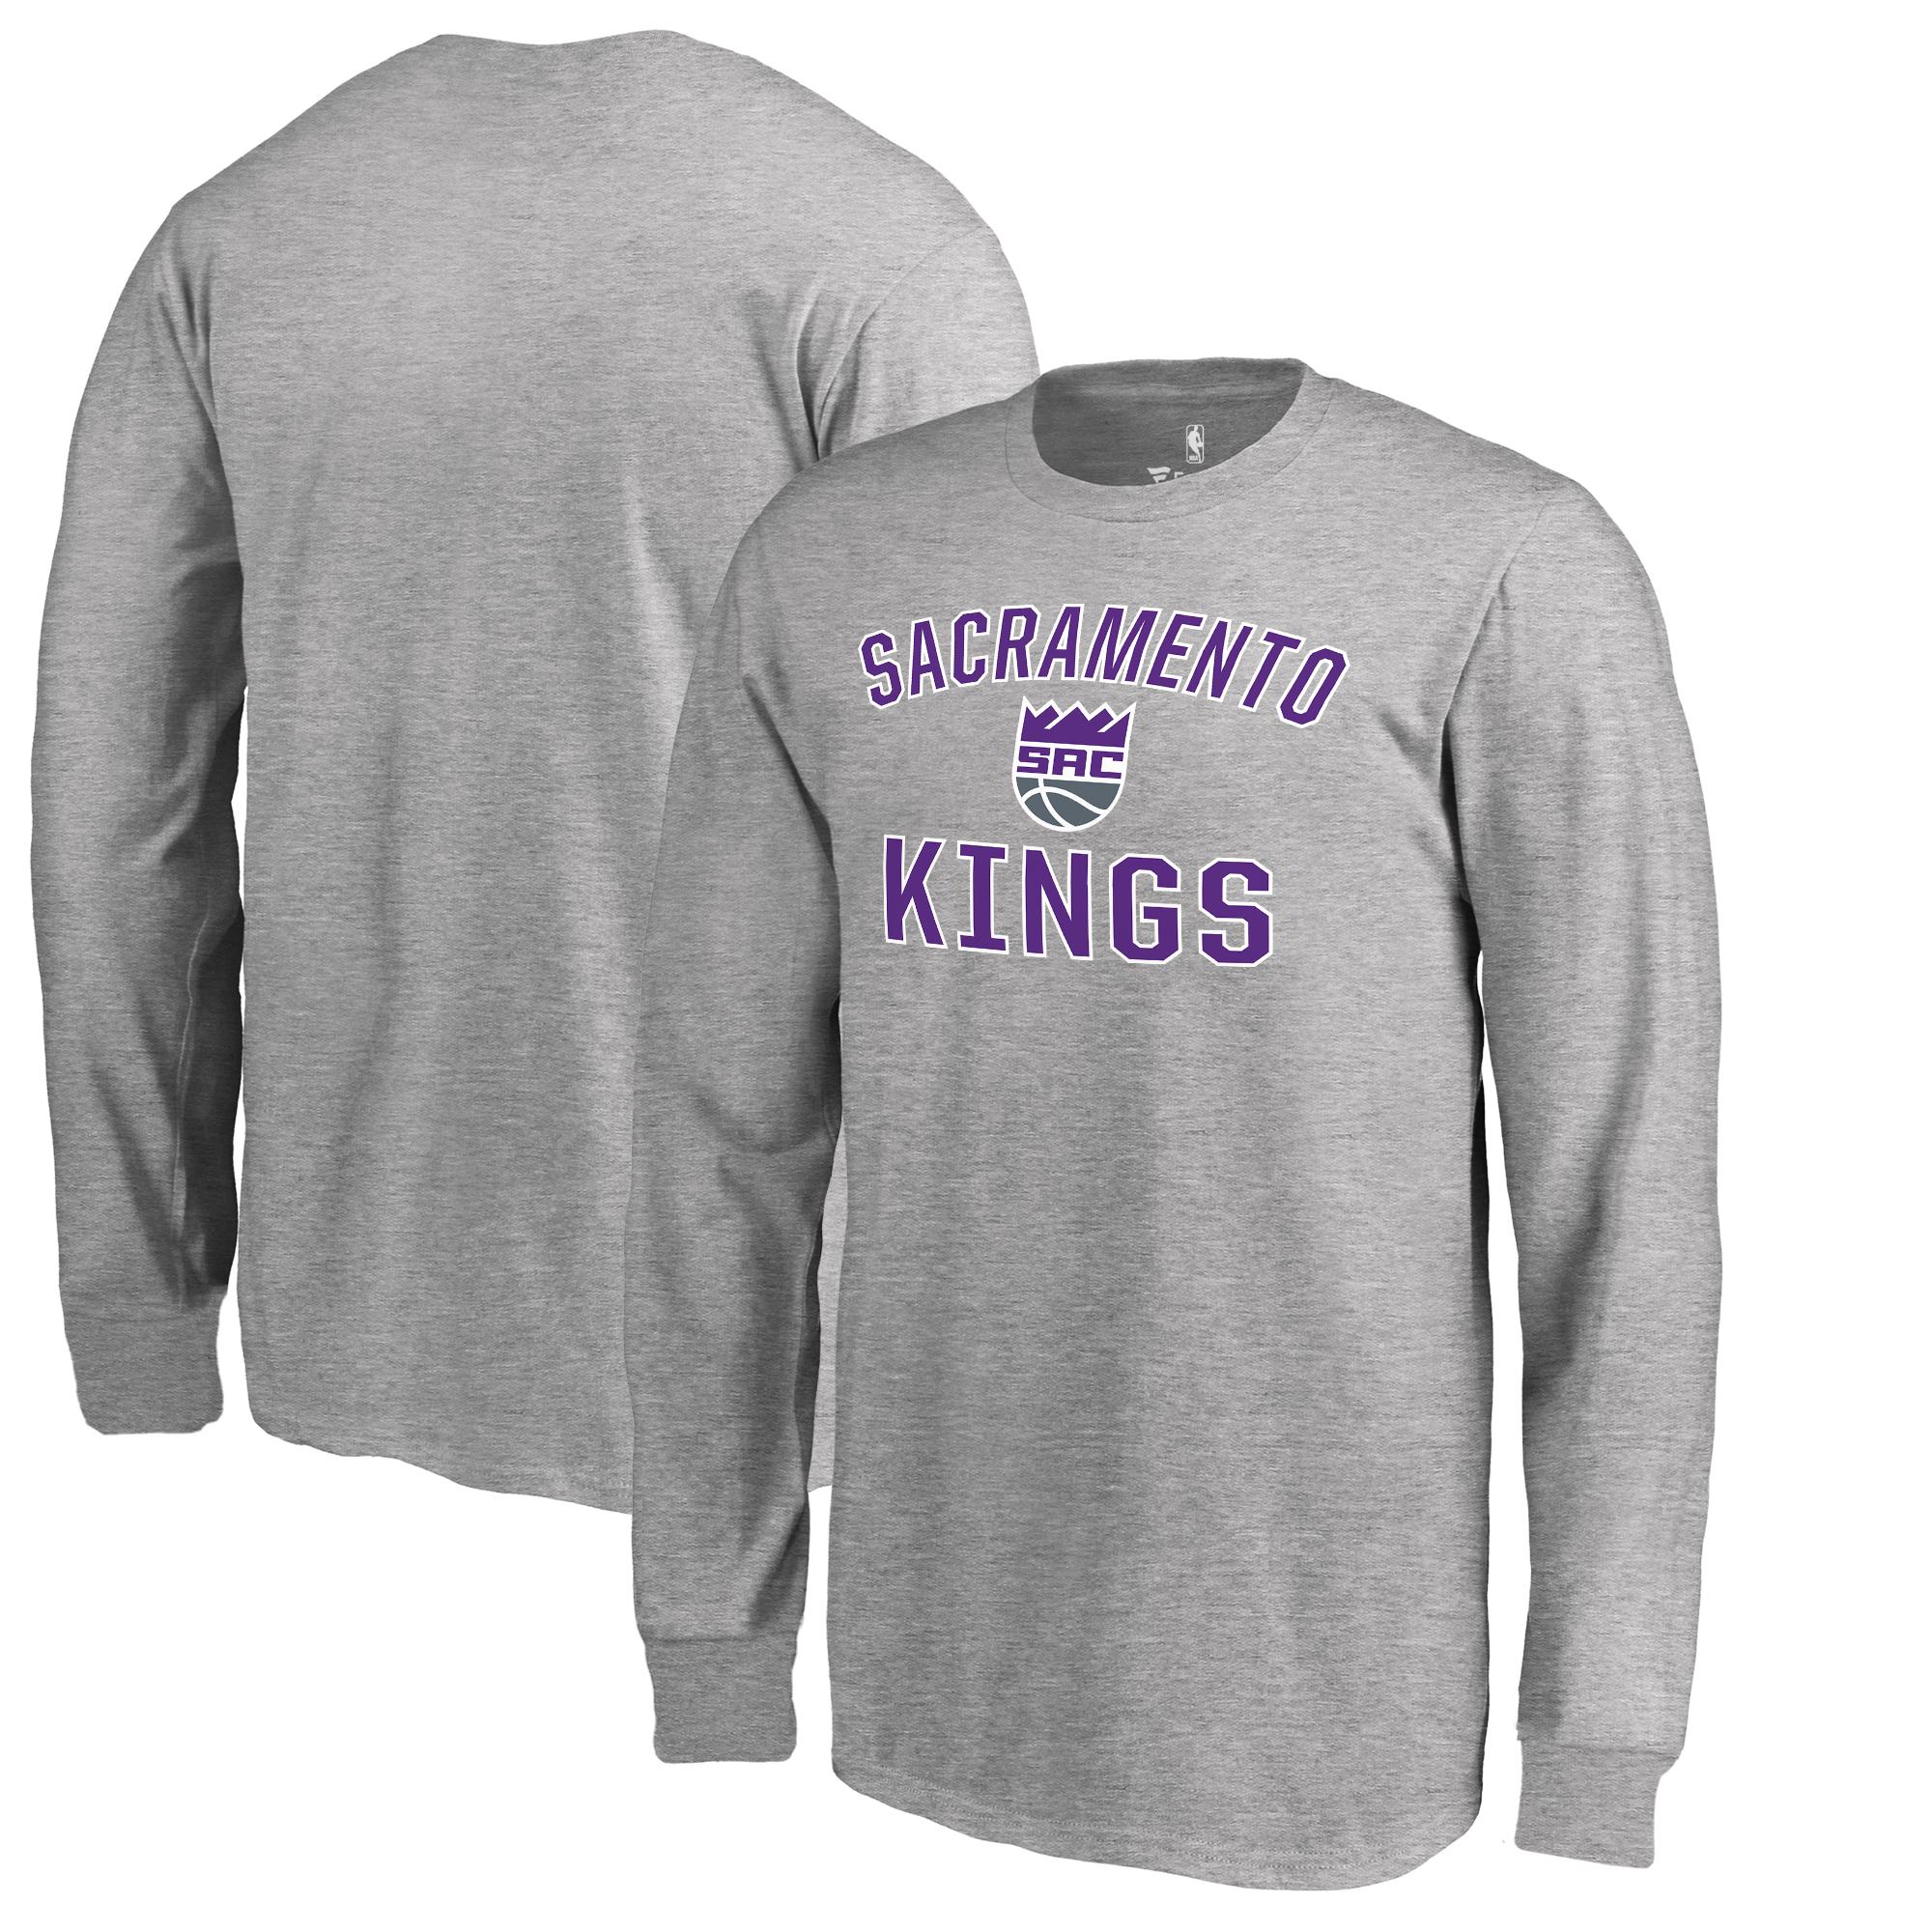 Sacramento Kings Fanatics Branded Youth Victory Arch Long Sleeve T-Shirt - Heathered Gray